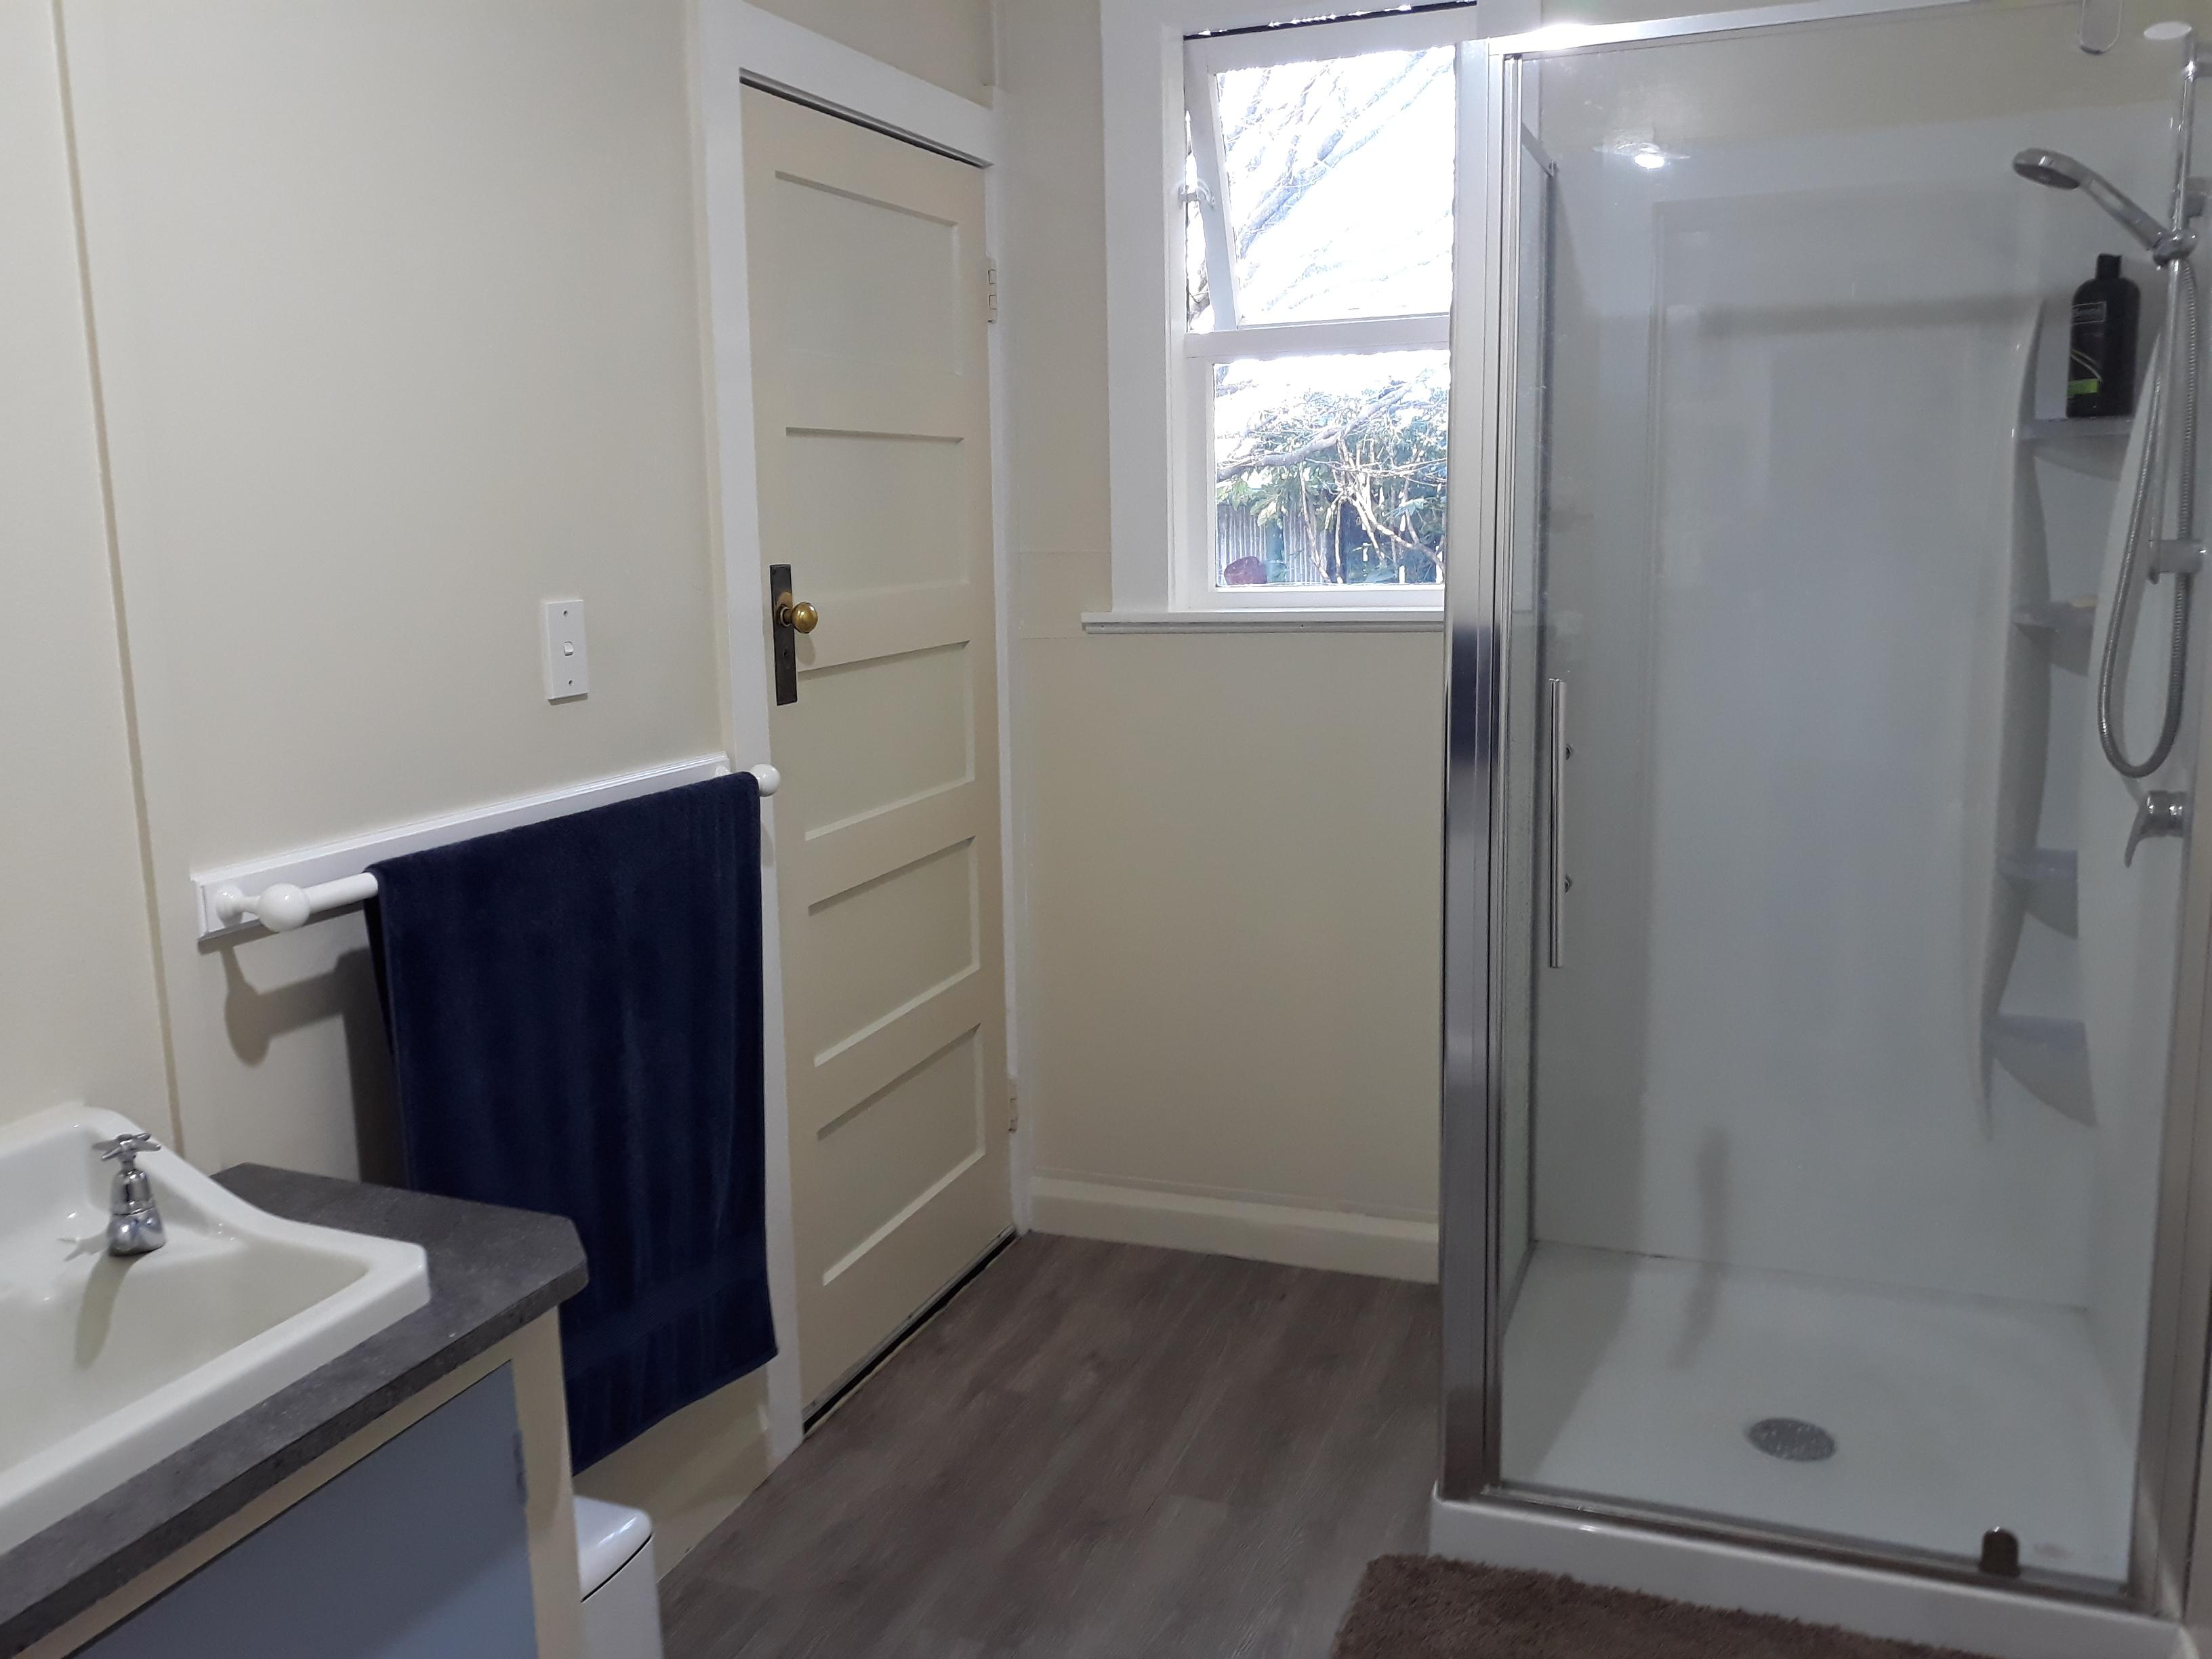 Fly Fishing Accommodation - Bathroom